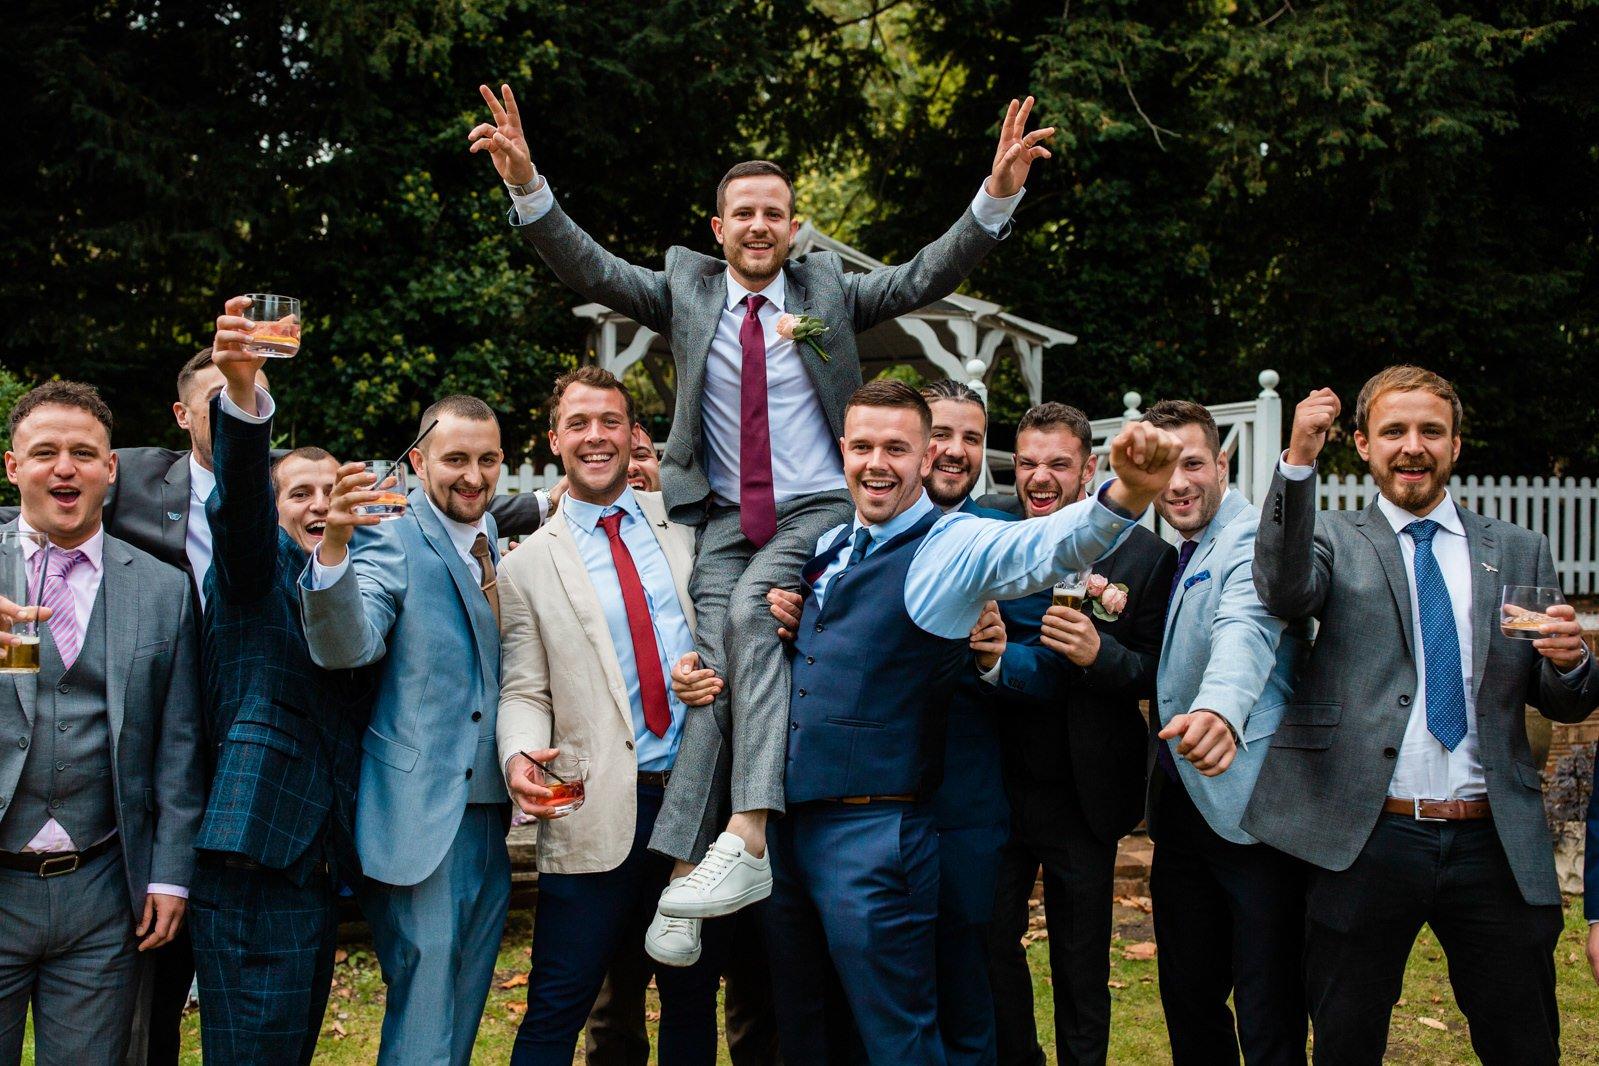 best wedding photos of 2019 58